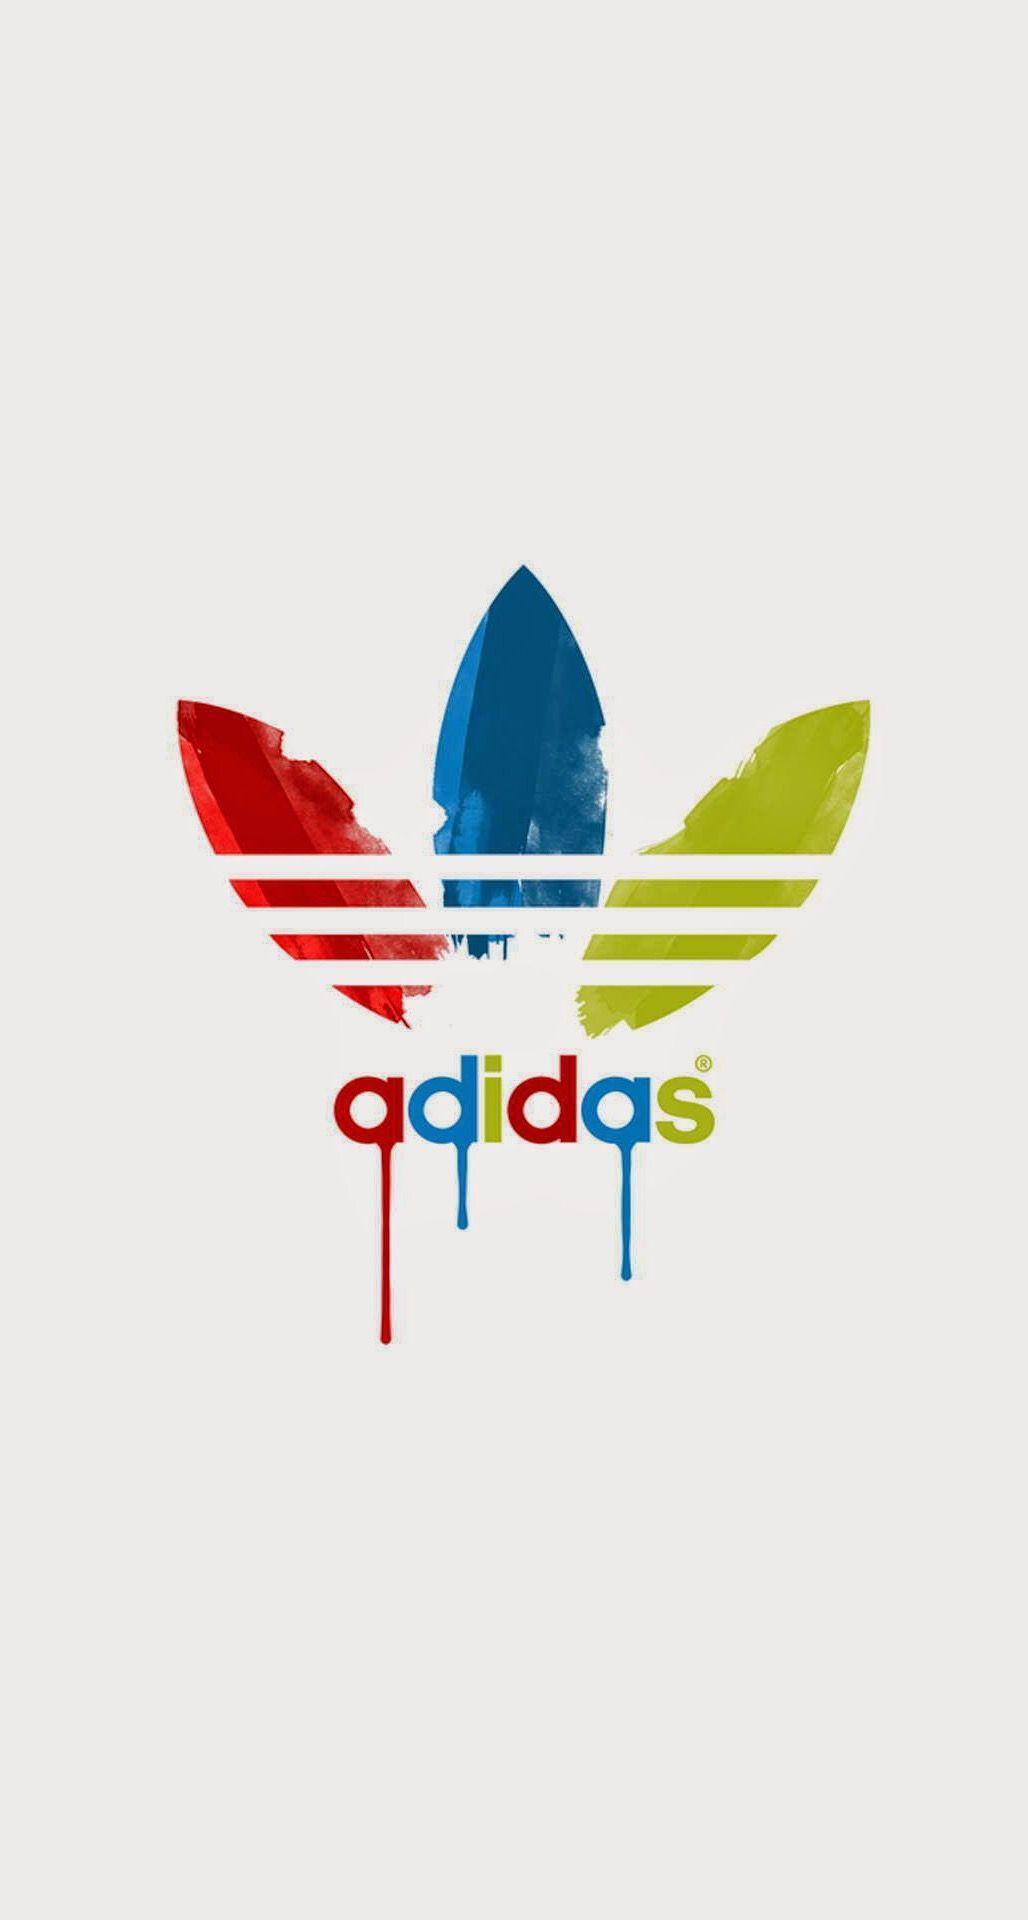 Adidas Dripping Paint Logo iPhone 6 Plus HD Wallpaper.jpg